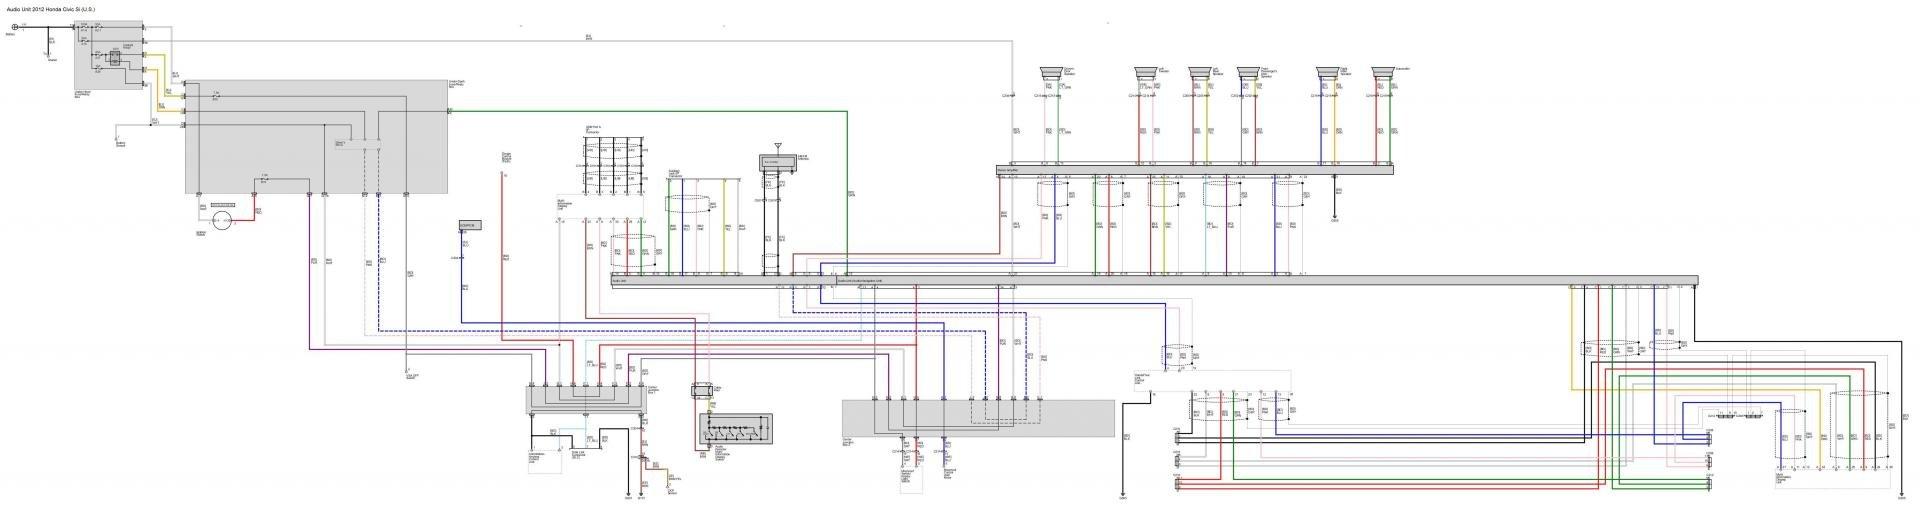 2012 Civic Wiring Diagram Worksheet And Honda Stereo Audio Diagrams Post Em If You Got Rh 9thgencivic Com Radio